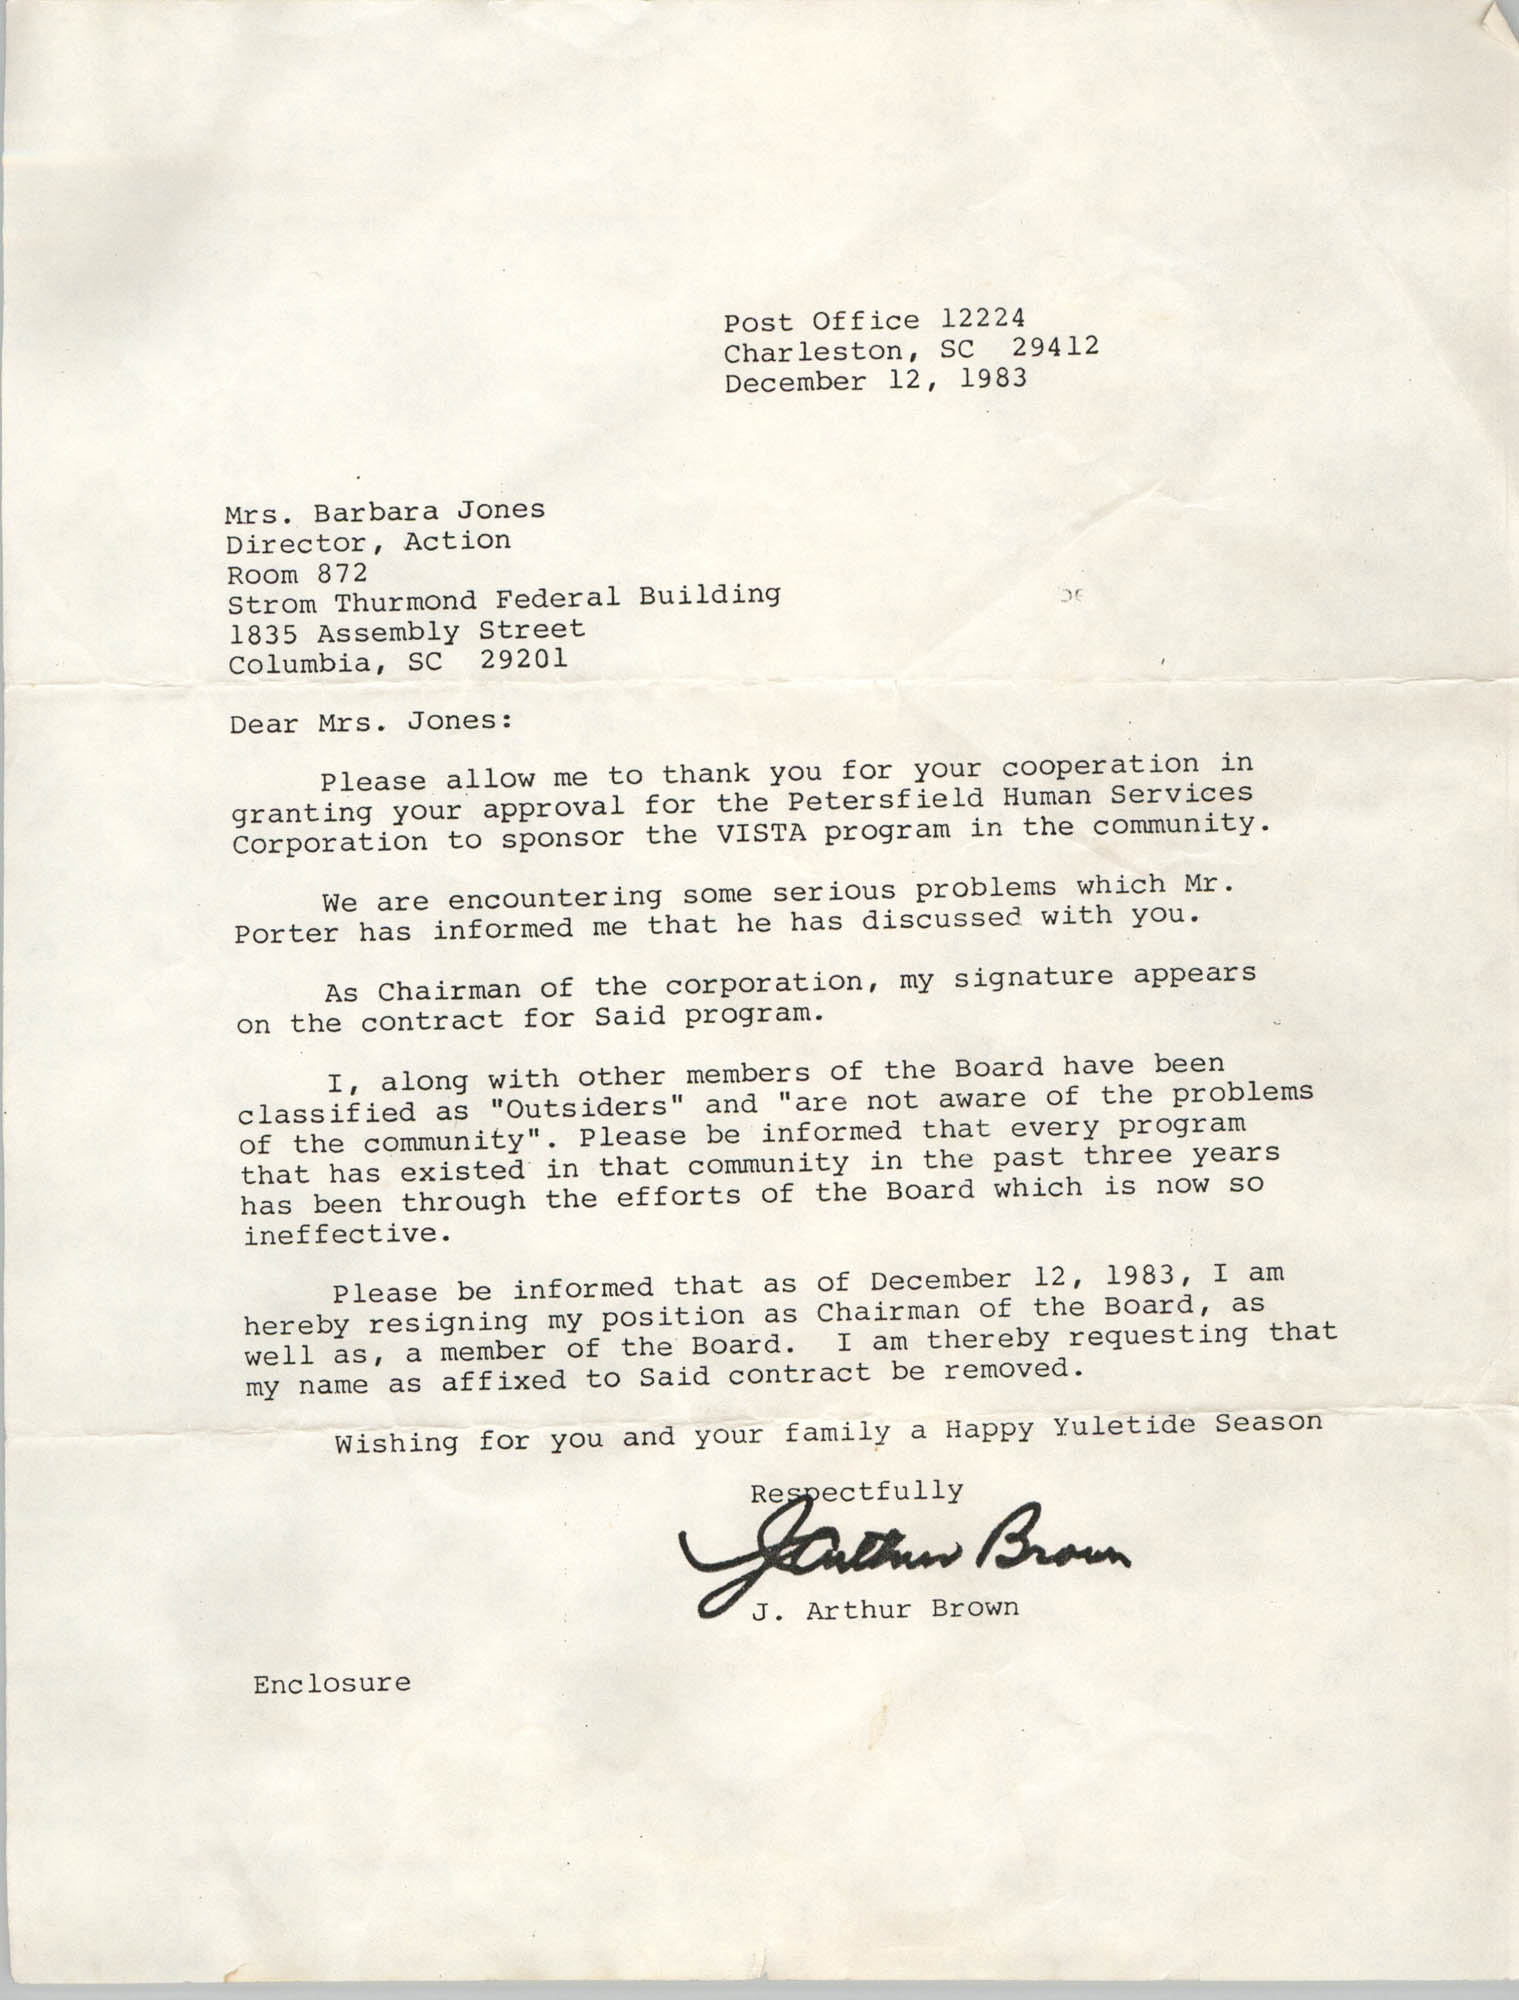 Letter from J. Arthur Brown to Barbara Jones, December 12, 1983